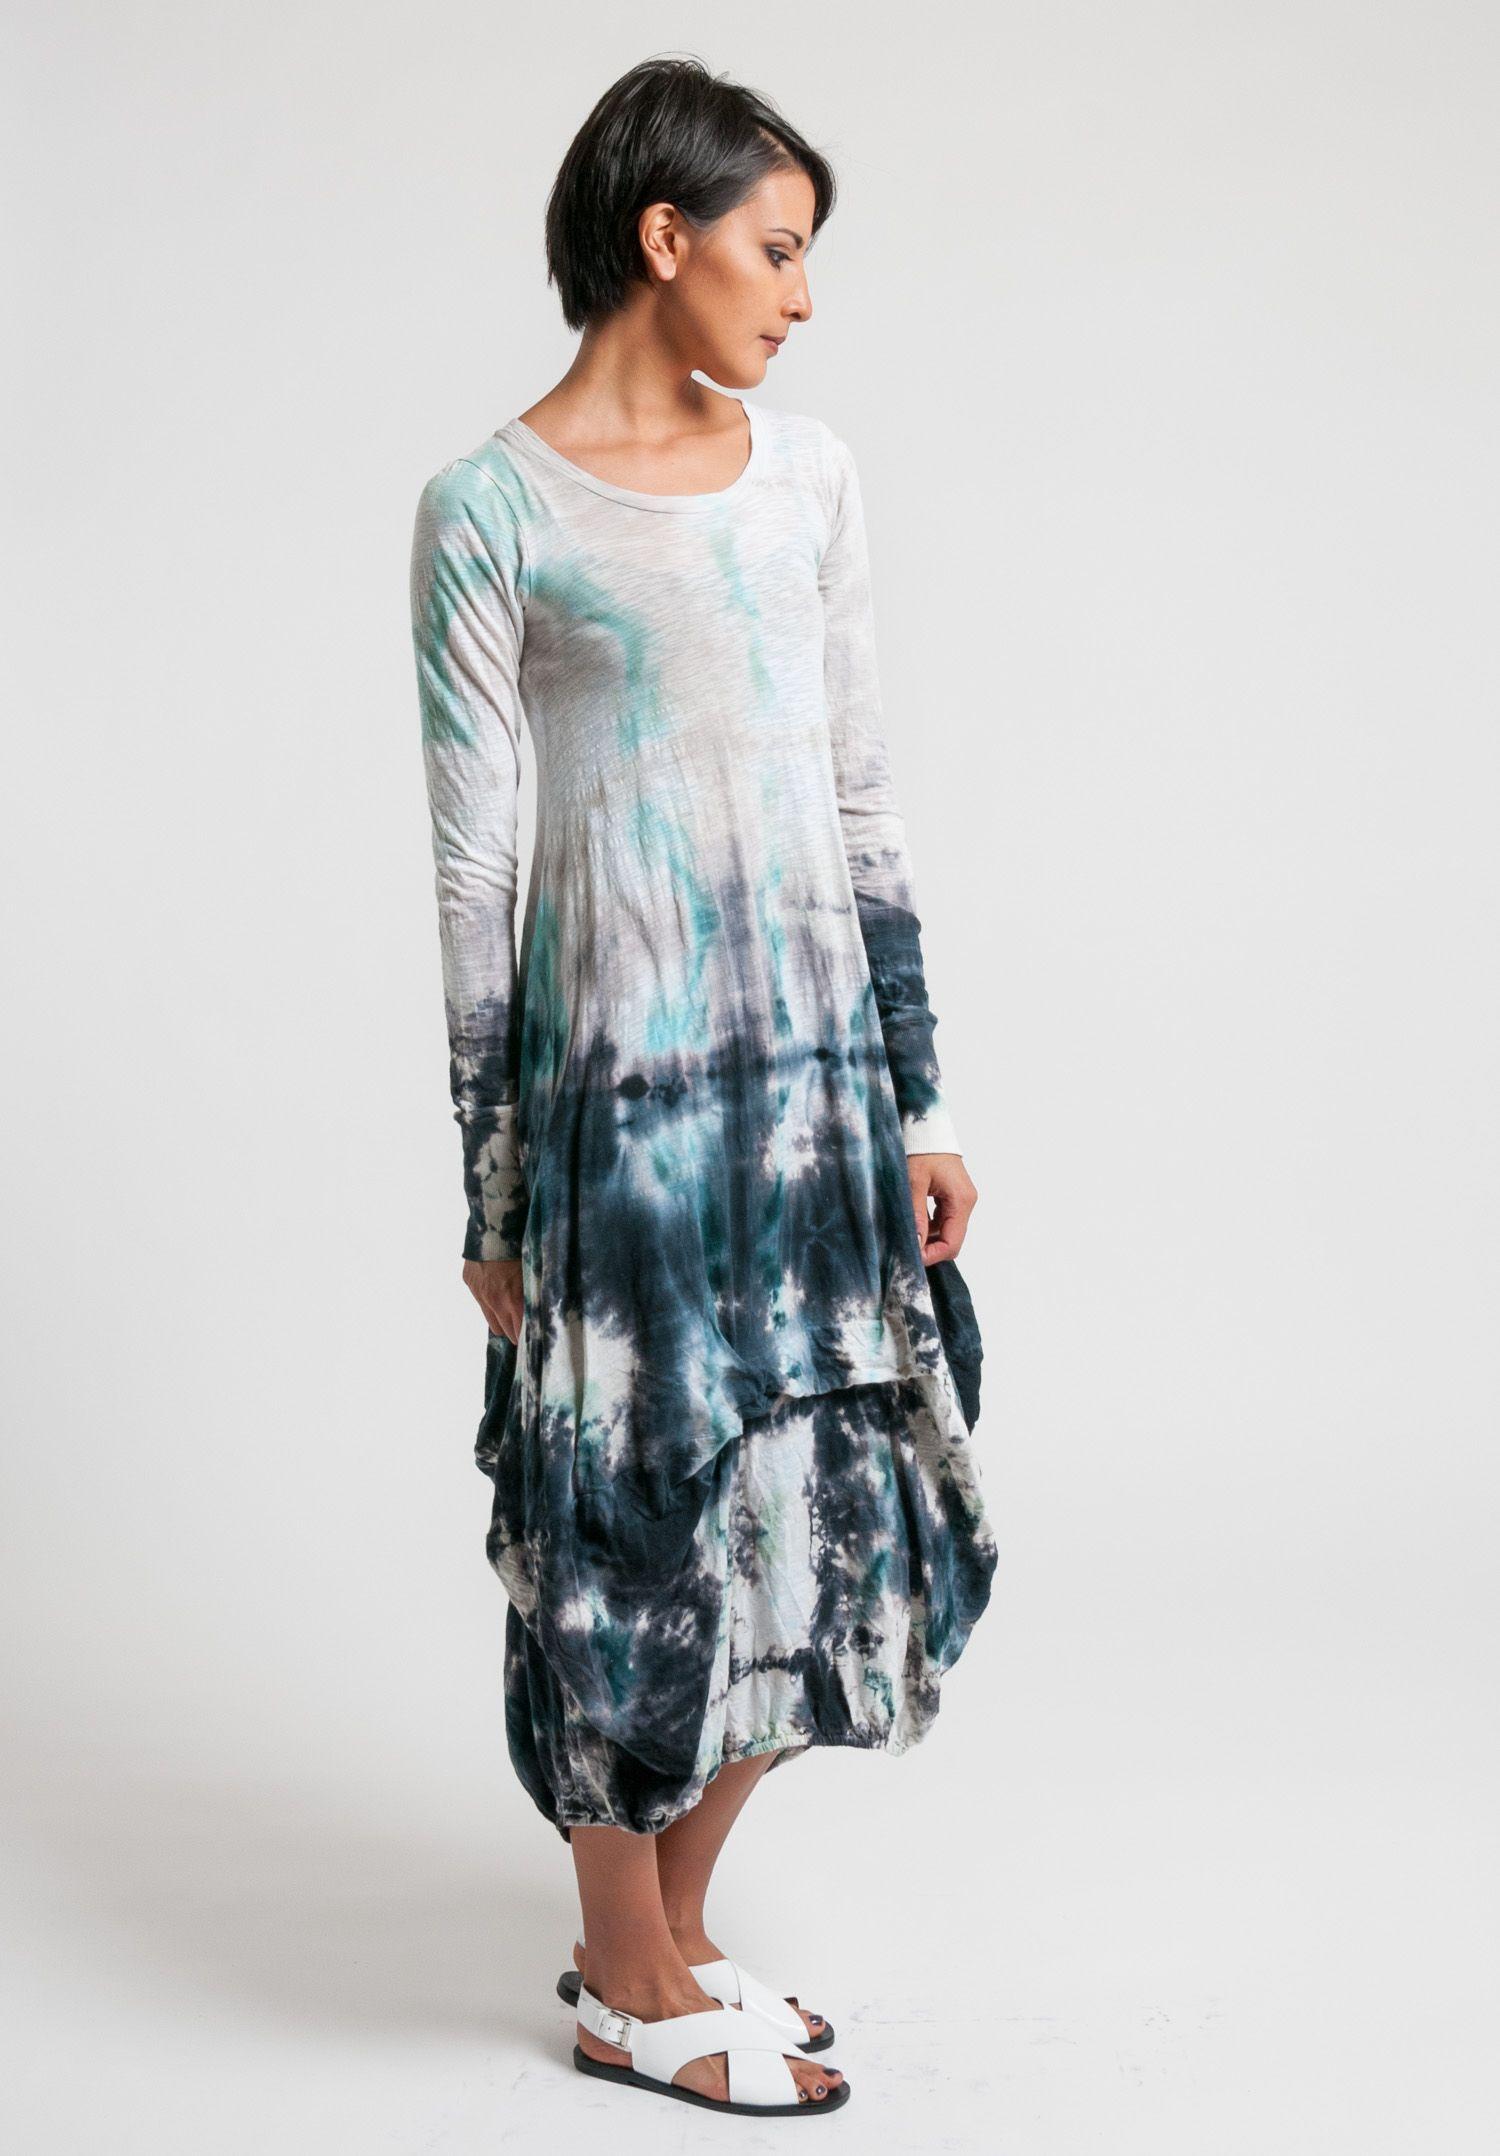 f7cea8c25998c Gilda Midani White & Blue Pattern Dyed Balloon Dress   Santa Fe Dry Goods # dress #aqua